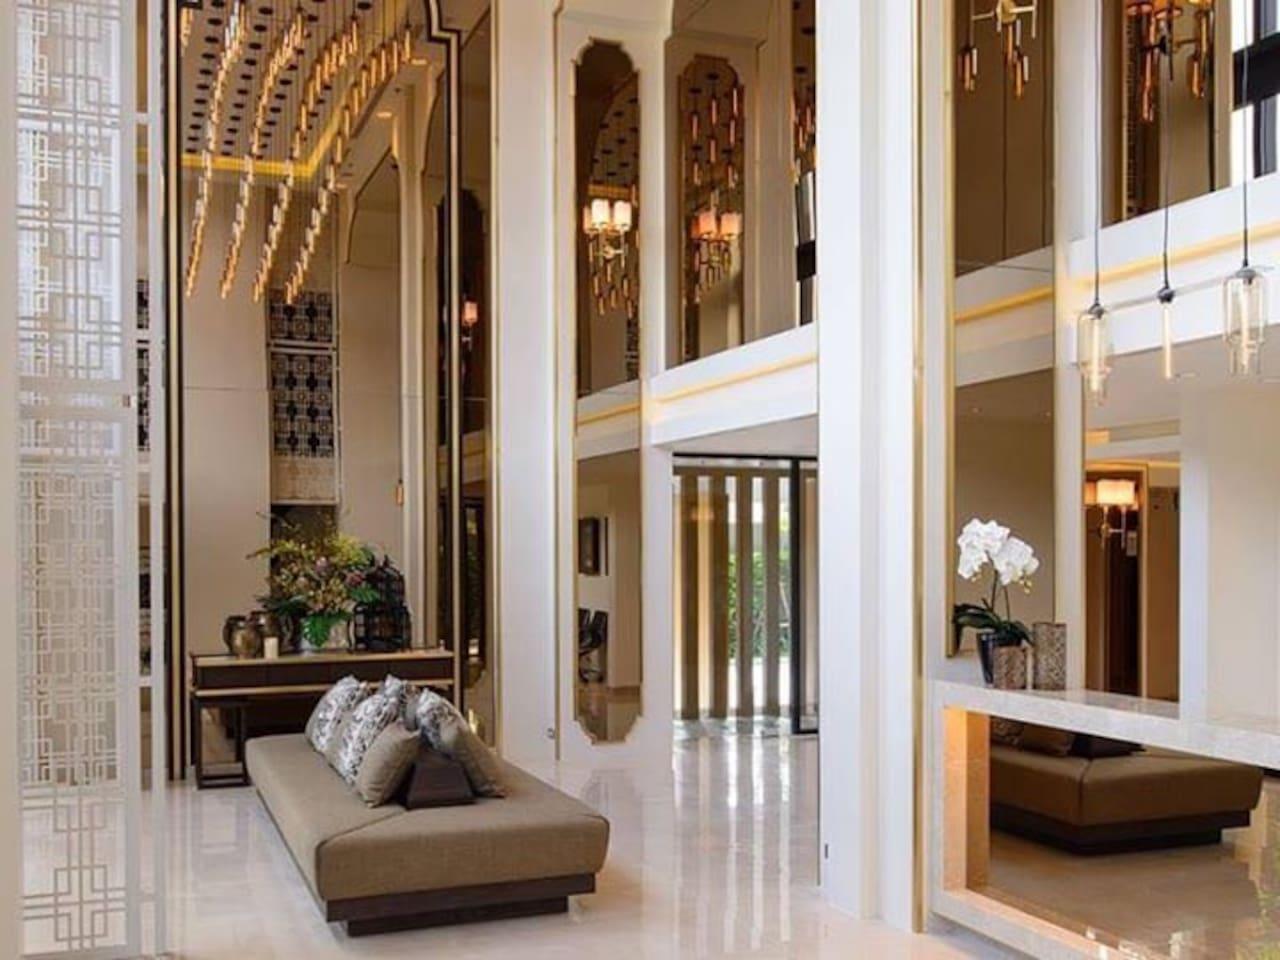 Luxury Room & Roof Top Pool in Phuket Town #H262 อพาร์ตเมนต์ 1 ห้องนอน 1 ห้องน้ำส่วนตัว ขนาด 35 ตร.ม. – ตัวเมืองภูเก็ต